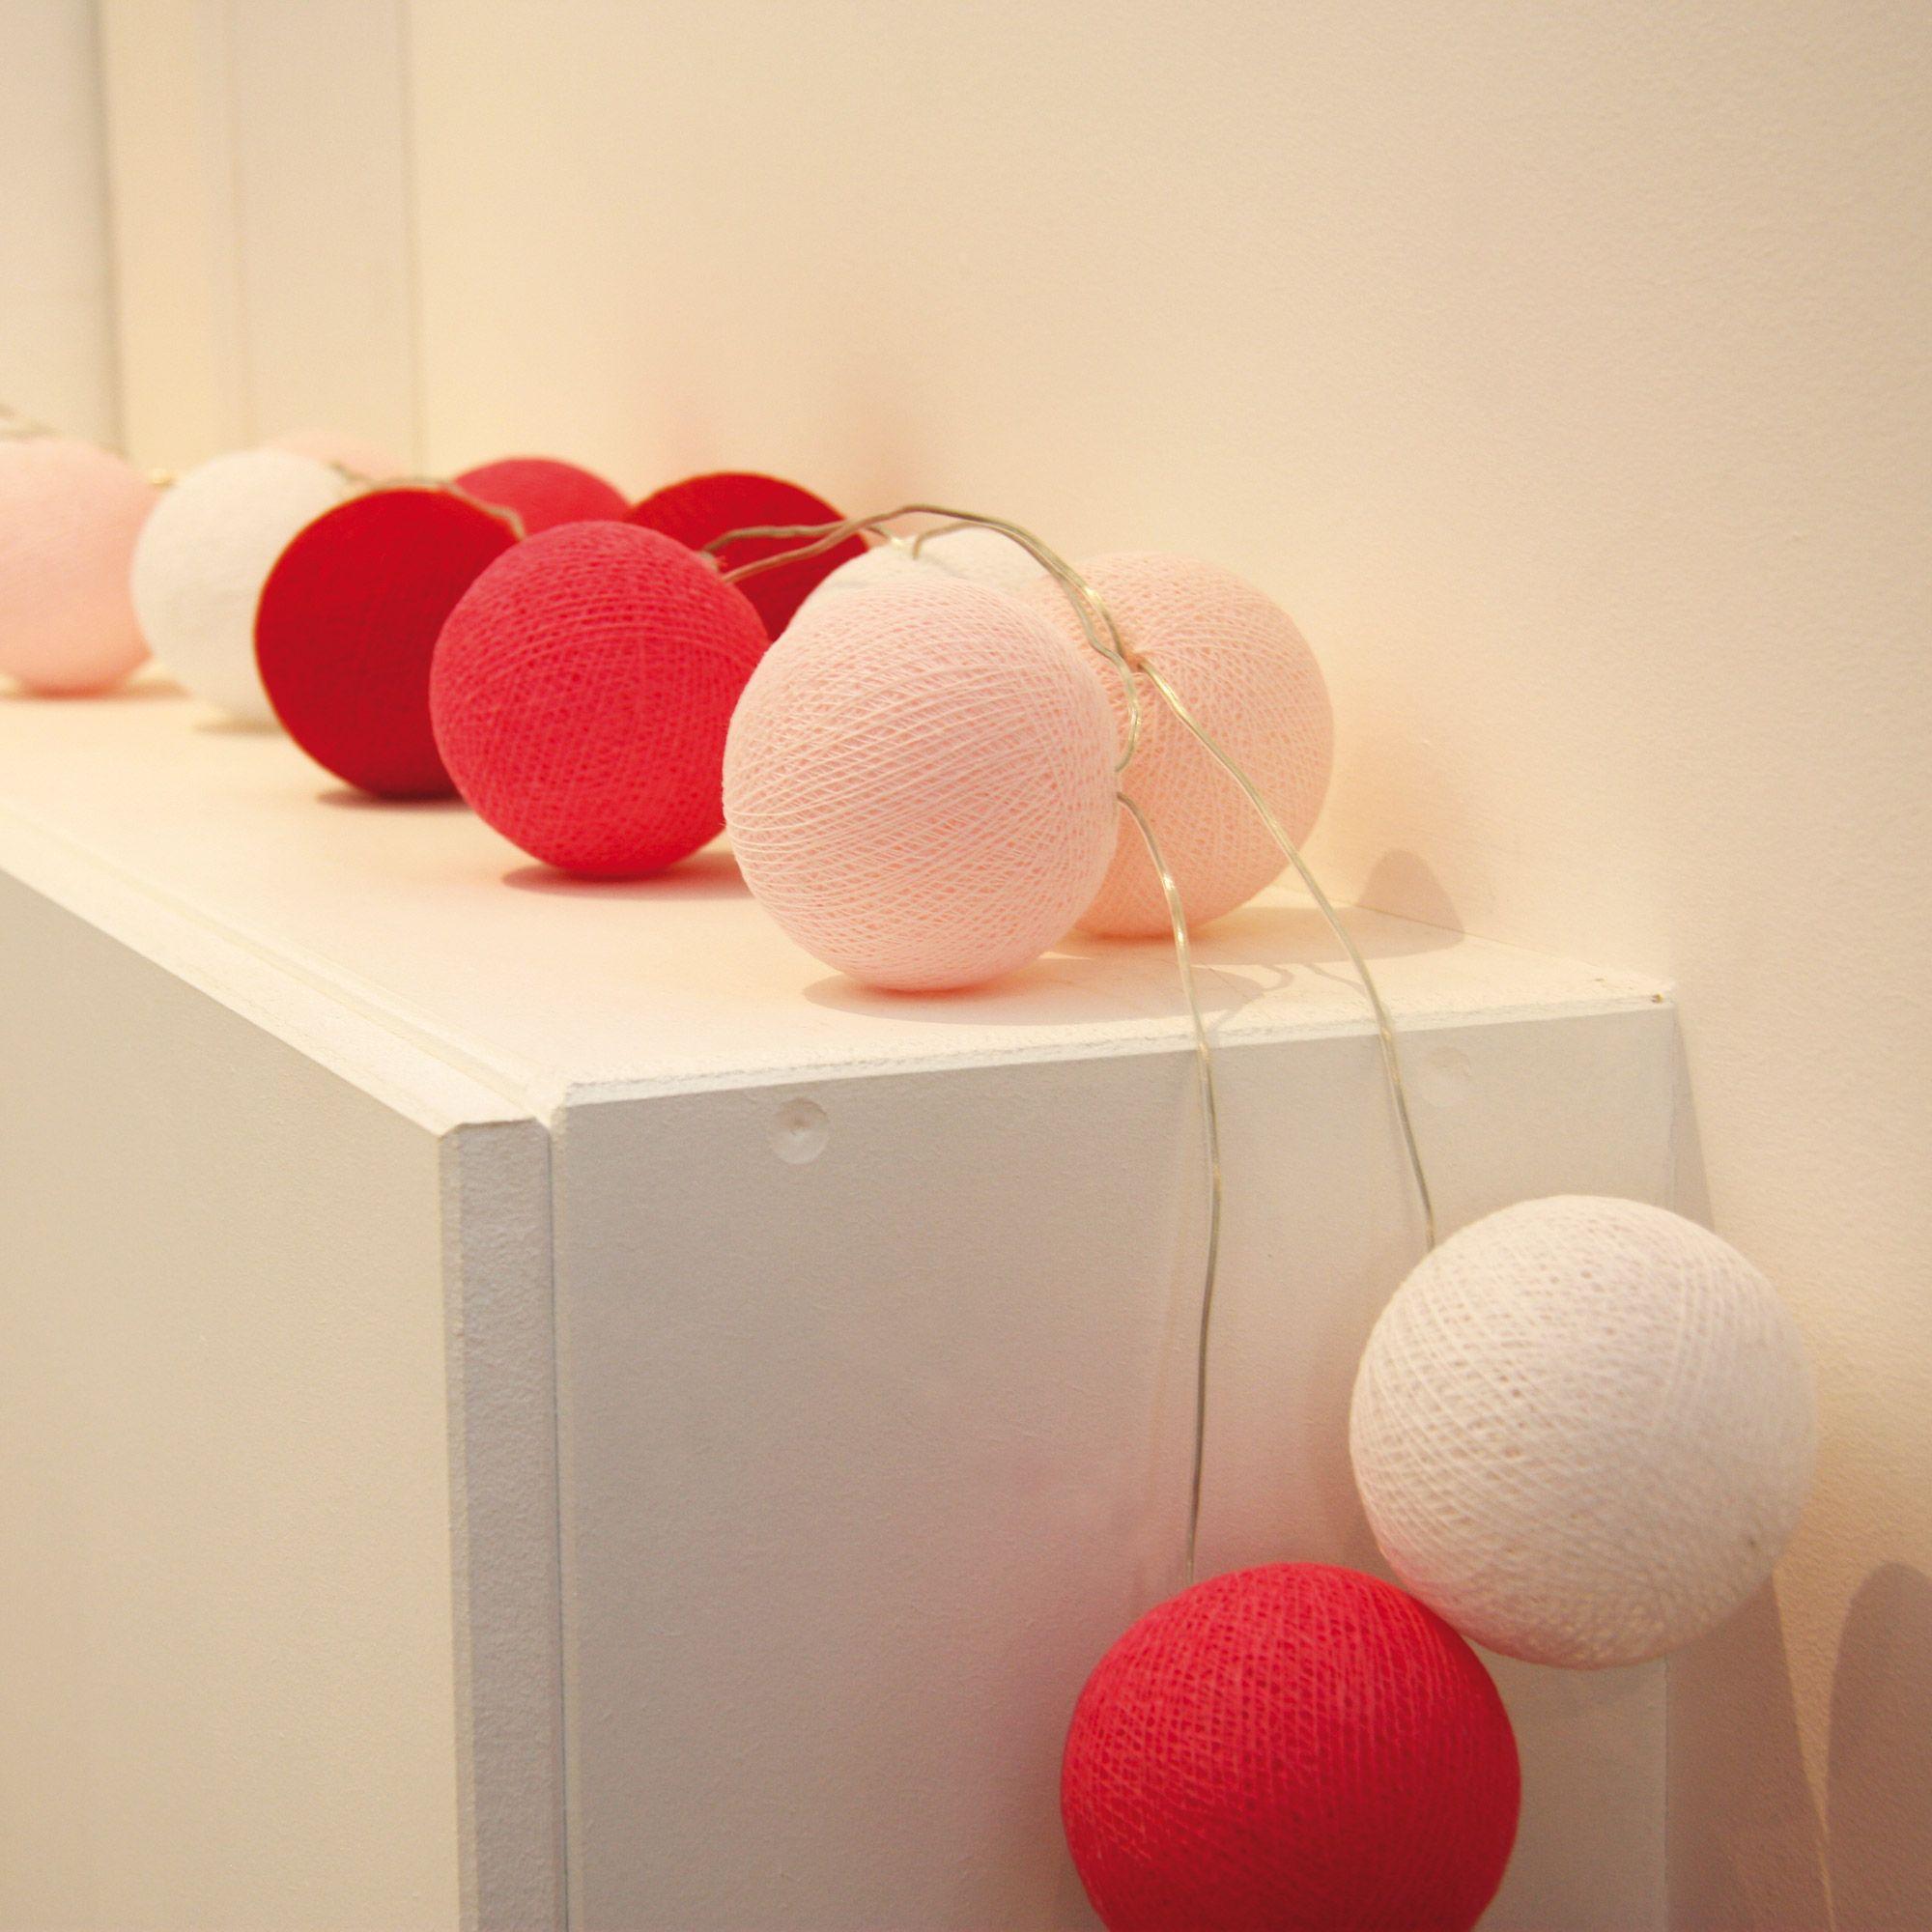 guirlande lumineuse 20 boules en coton longueur 5m atelier de famille rose guirlande. Black Bedroom Furniture Sets. Home Design Ideas